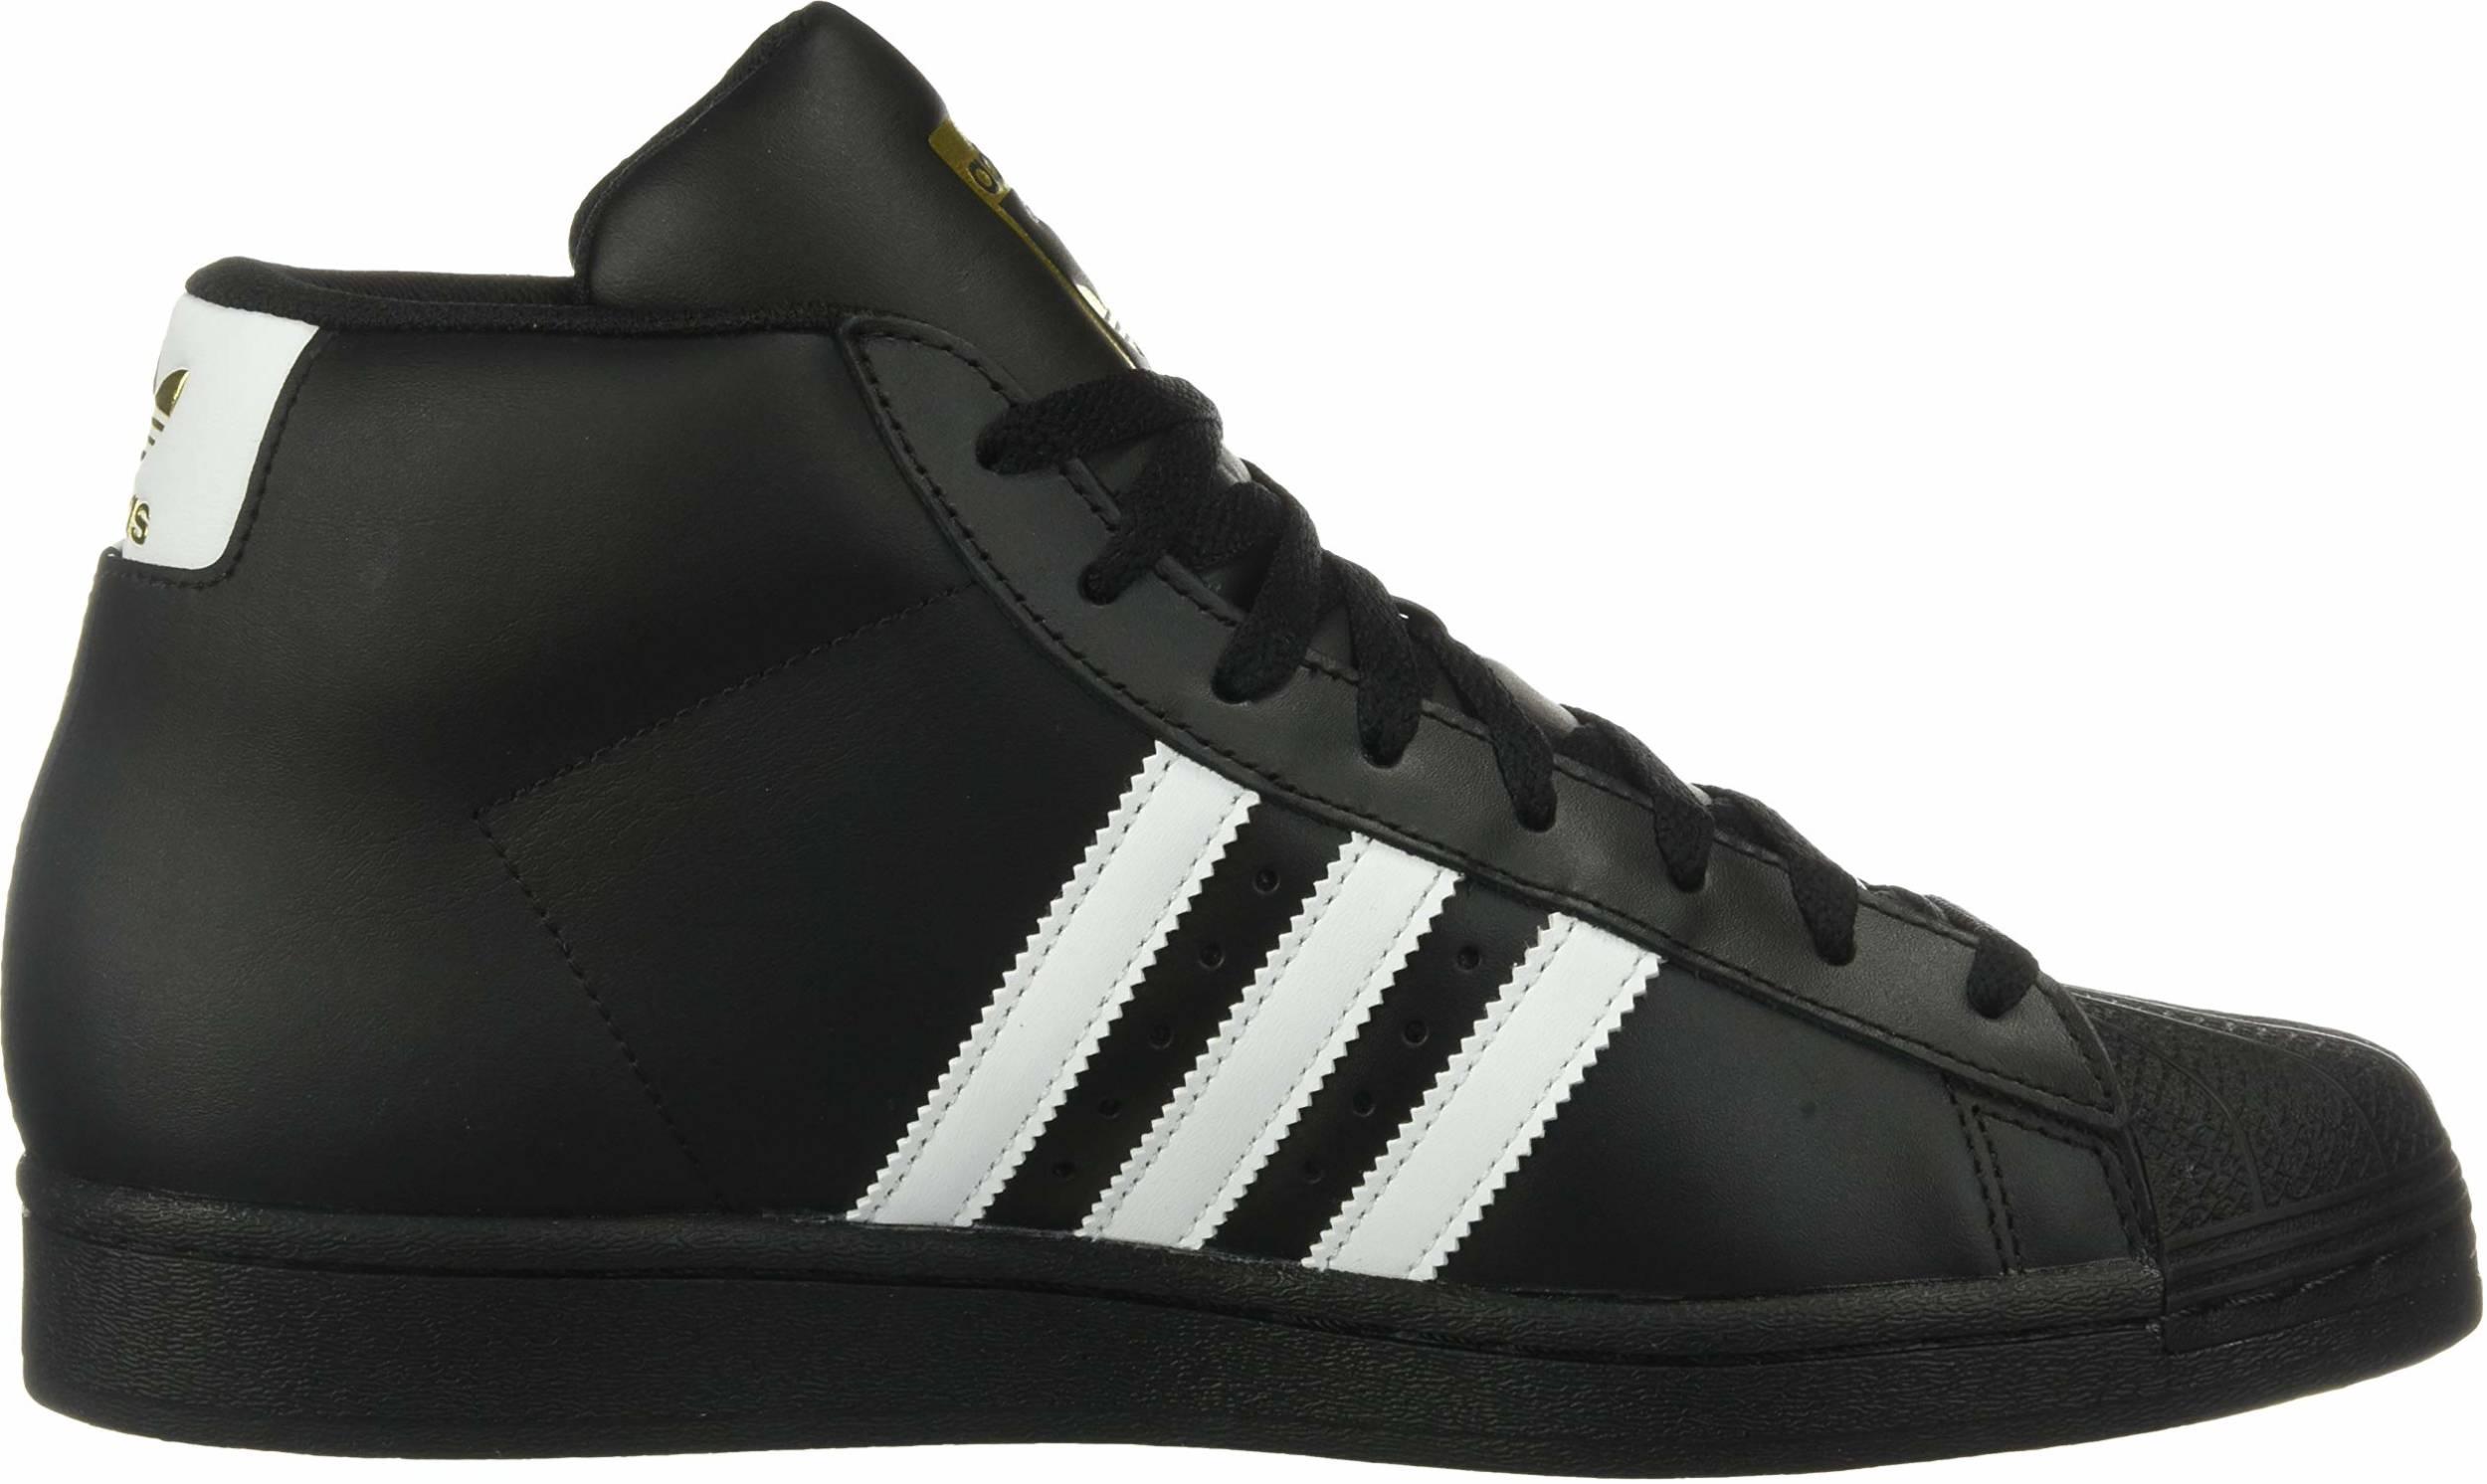 Save 58% on Adidas Originals Sneakers